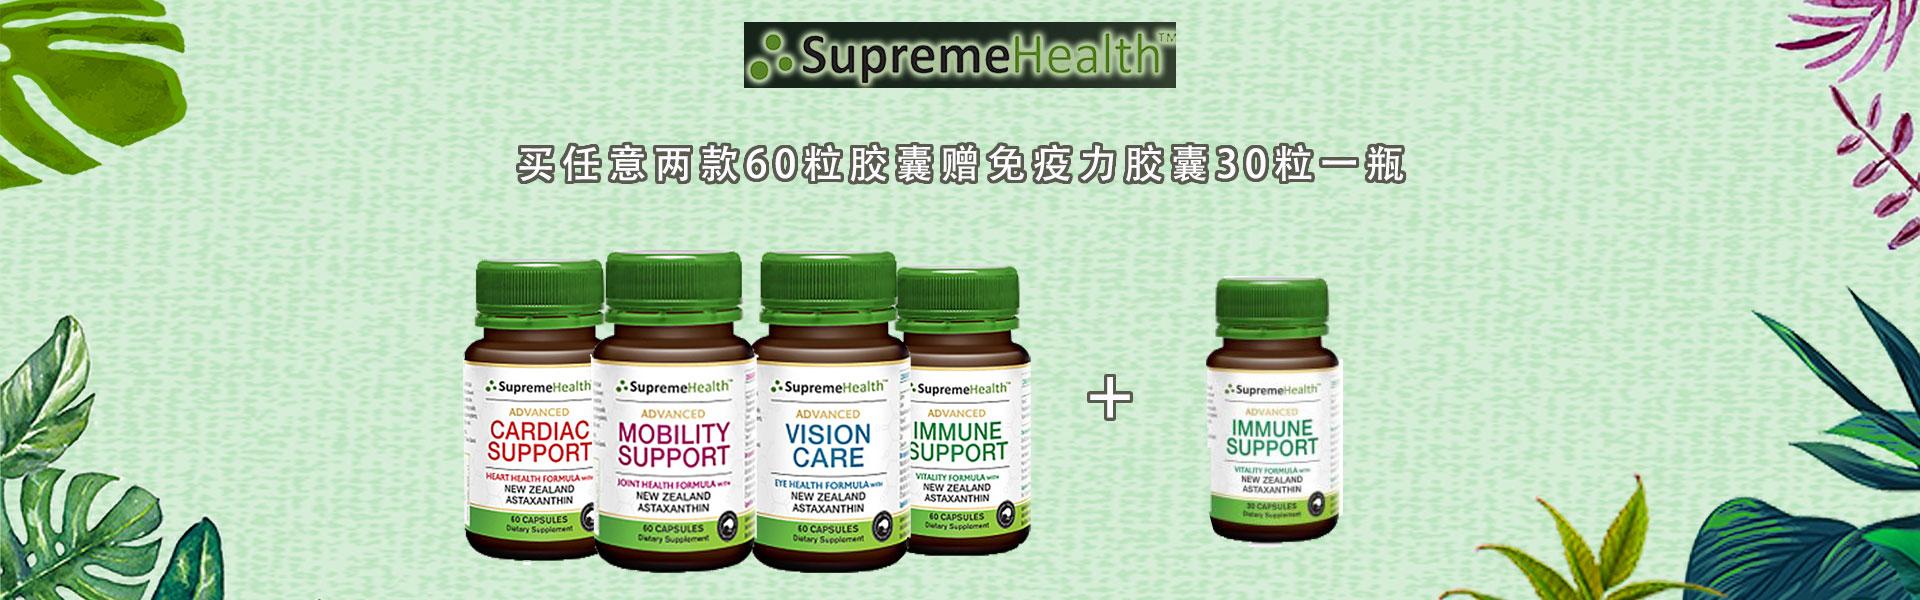 SupremeHealth任意一款60粒胶囊赠免疫力30粒一瓶